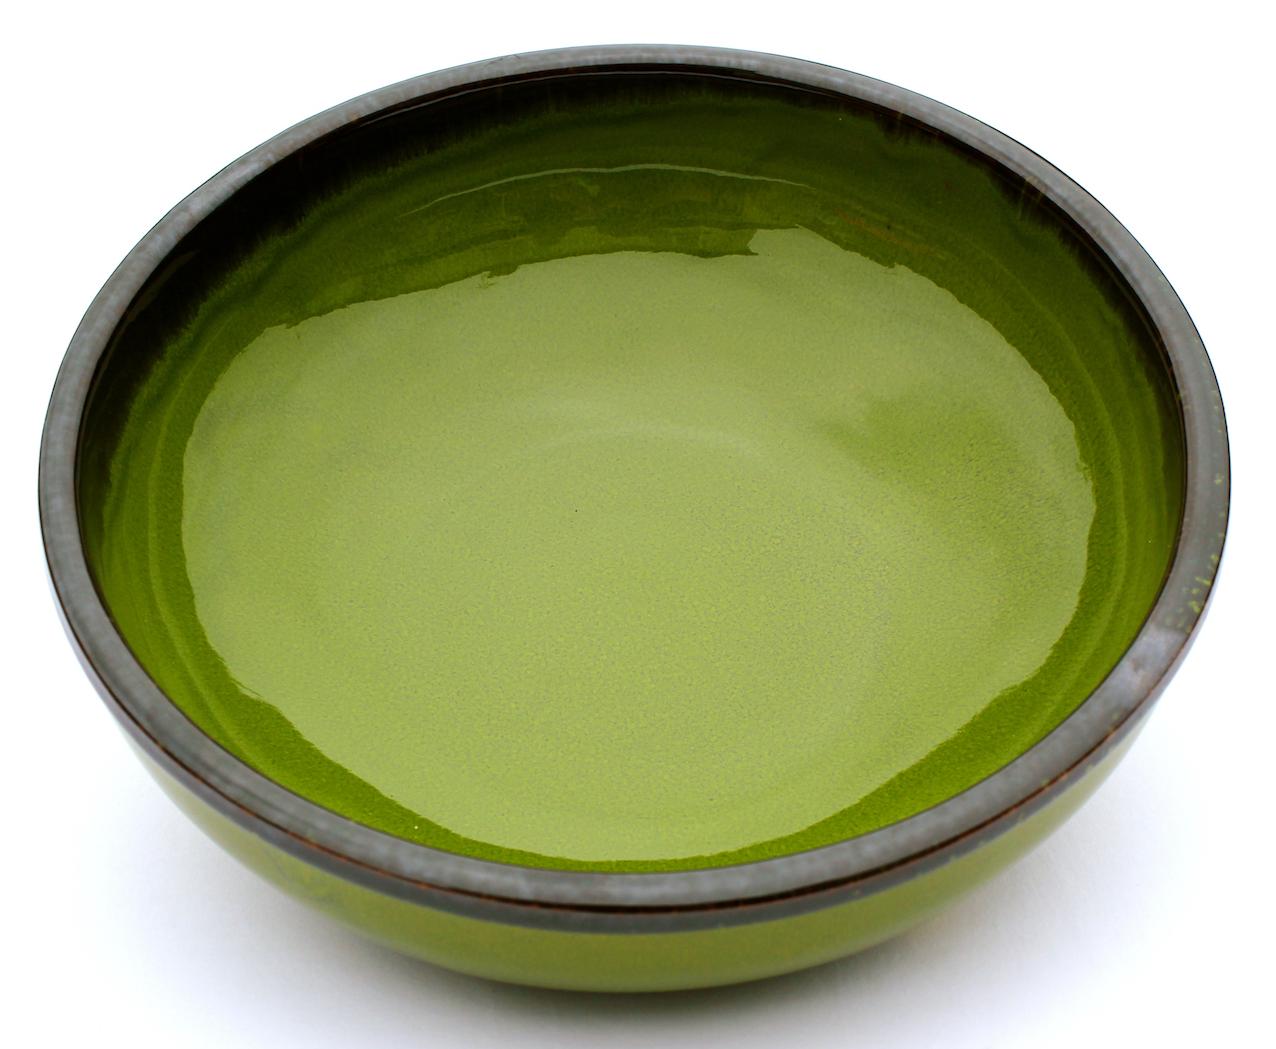 Elana pearl-green